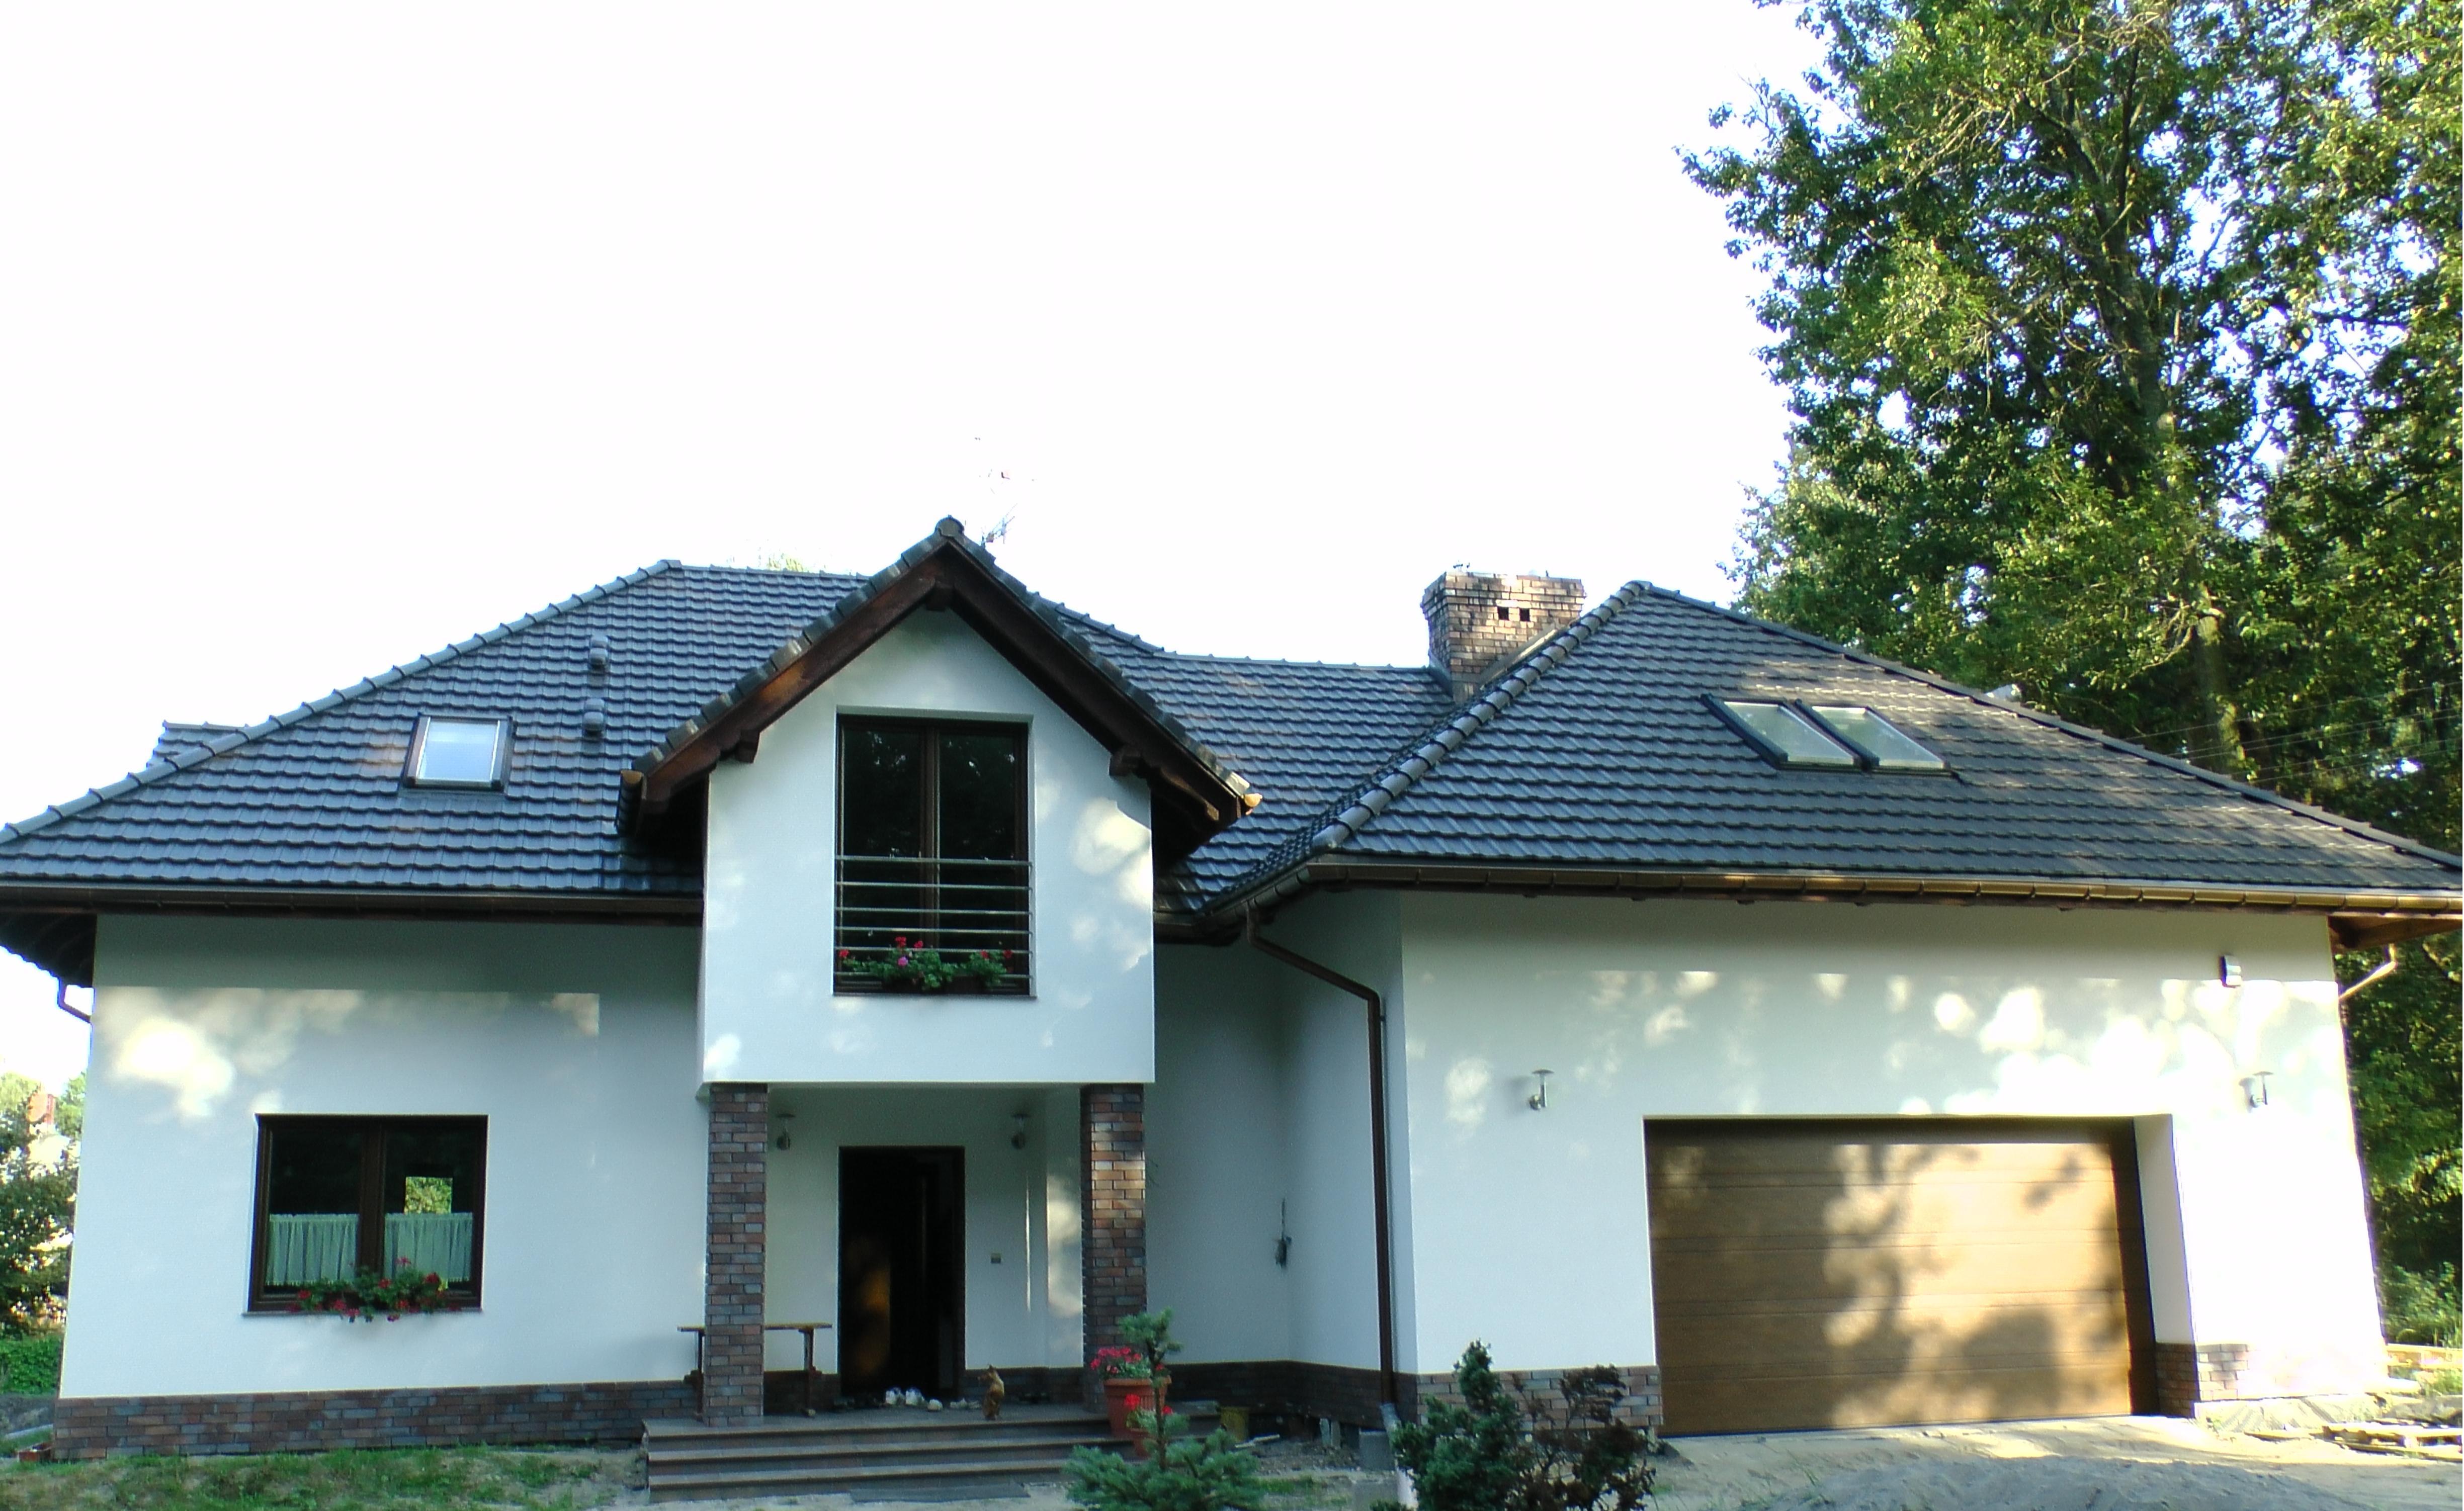 ewa-piotrowska-1375810556_1152.jpg